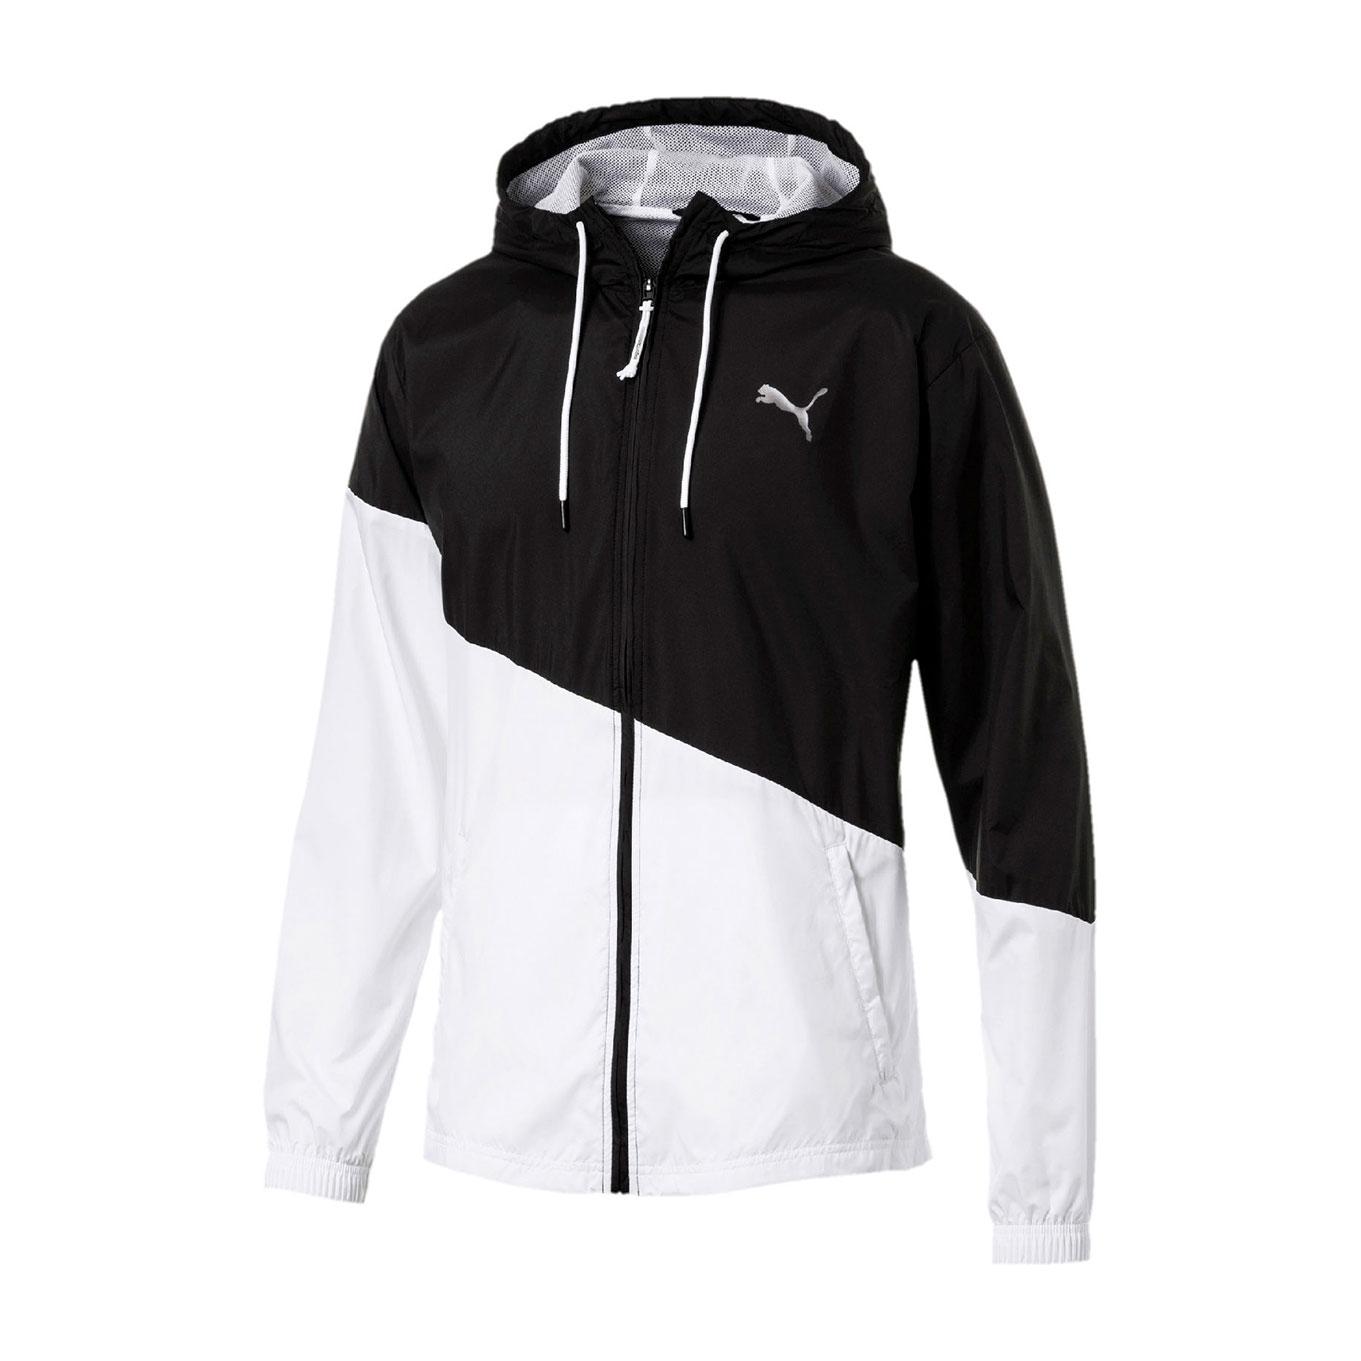 d17548903ea6 Puma Men s A.C.E Windbreak Training Jacket - Black White